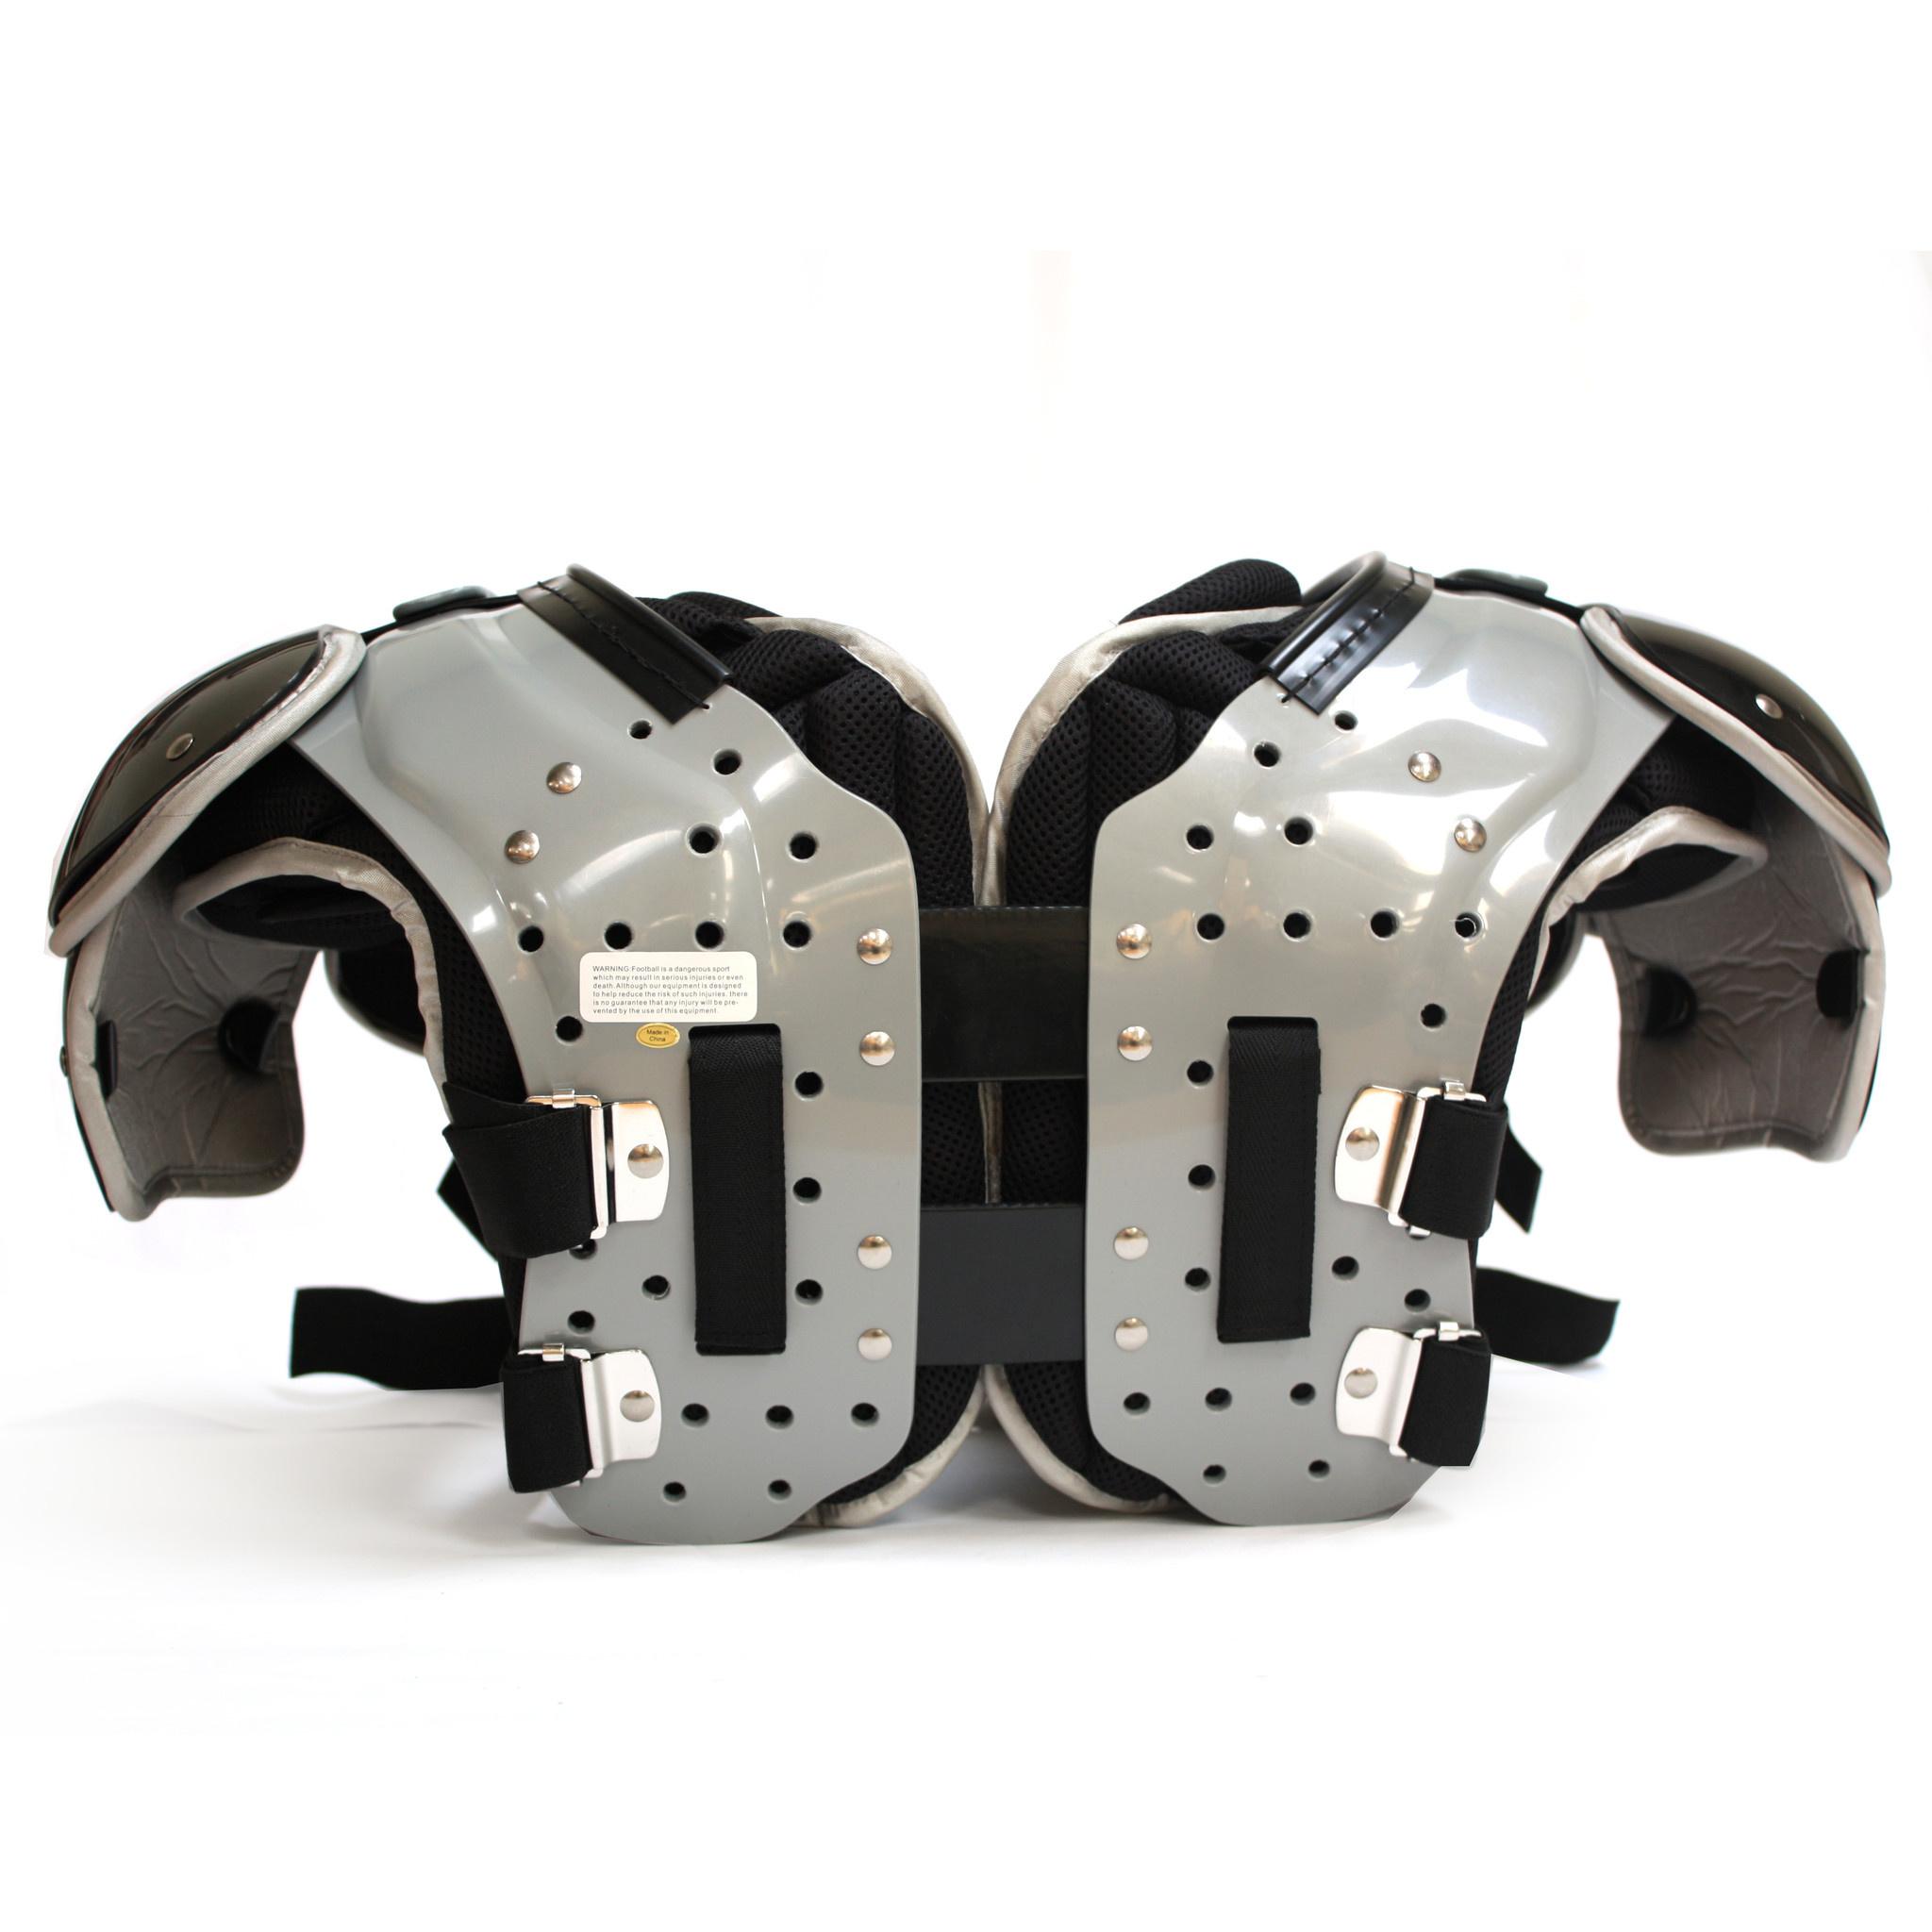 Z-430 II Elite light football shoulder pad, black HB-FB-LB-TE-DL